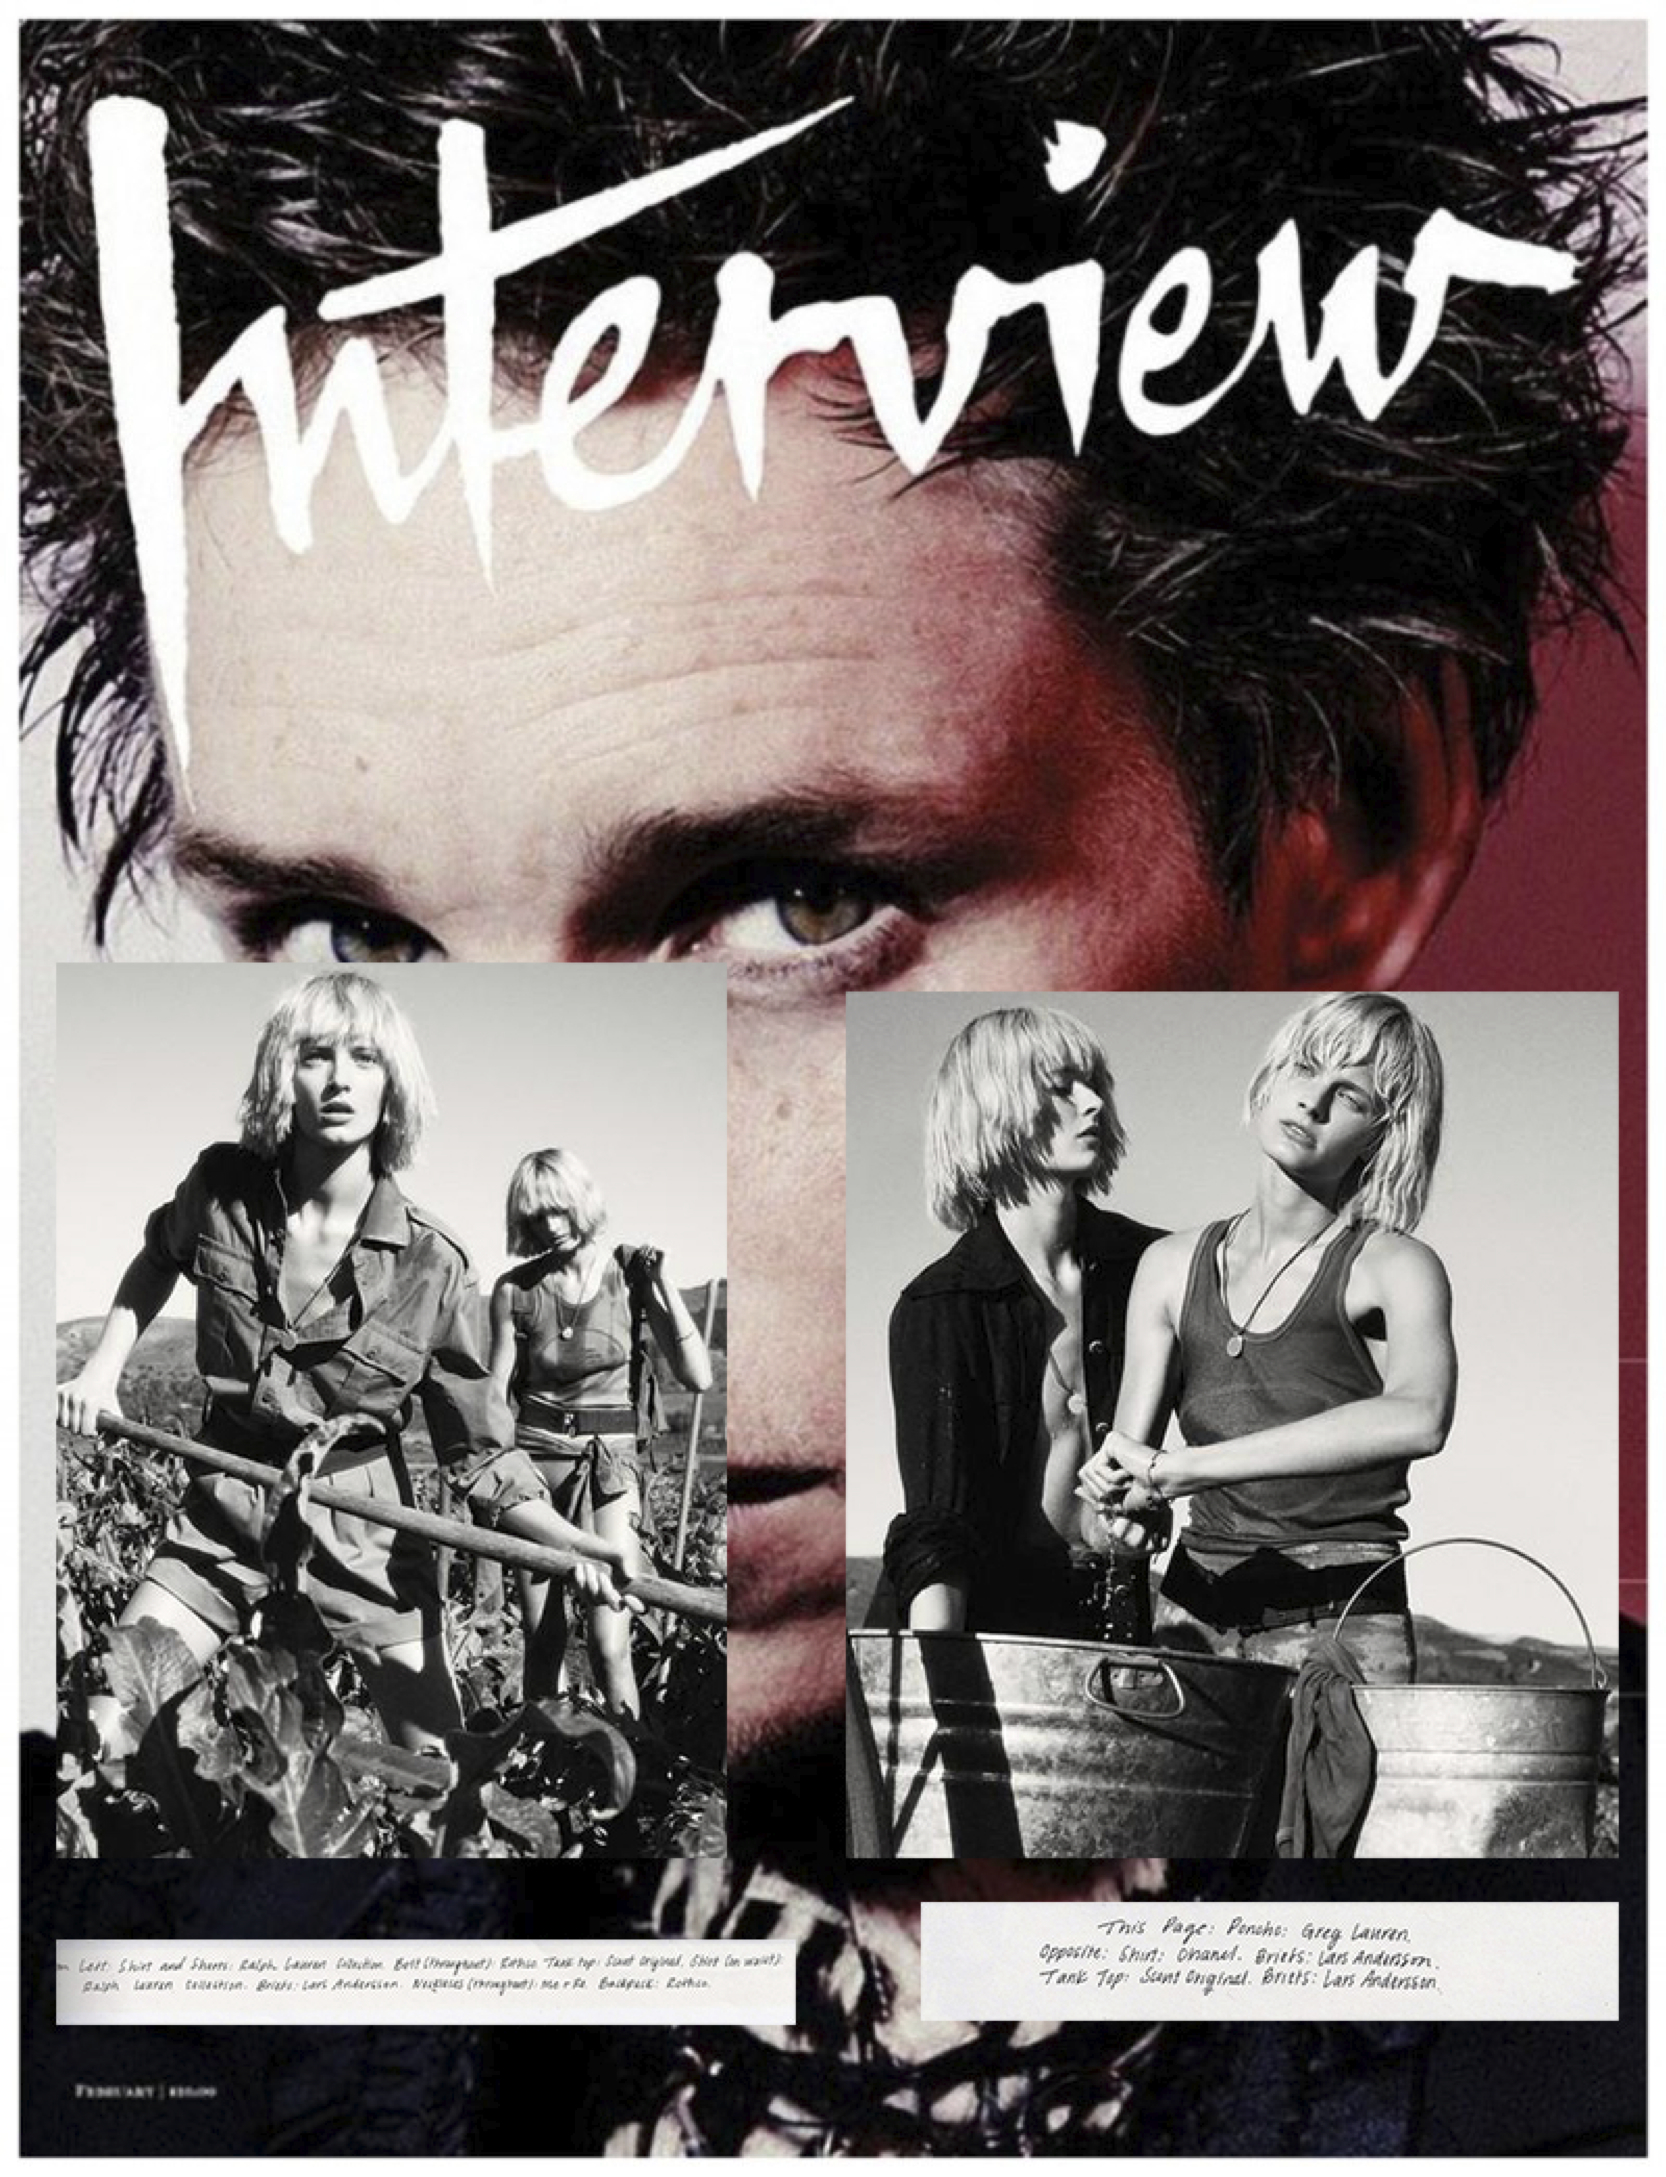 Interview X Lars Andersson 2  (1) copy 2.jpg